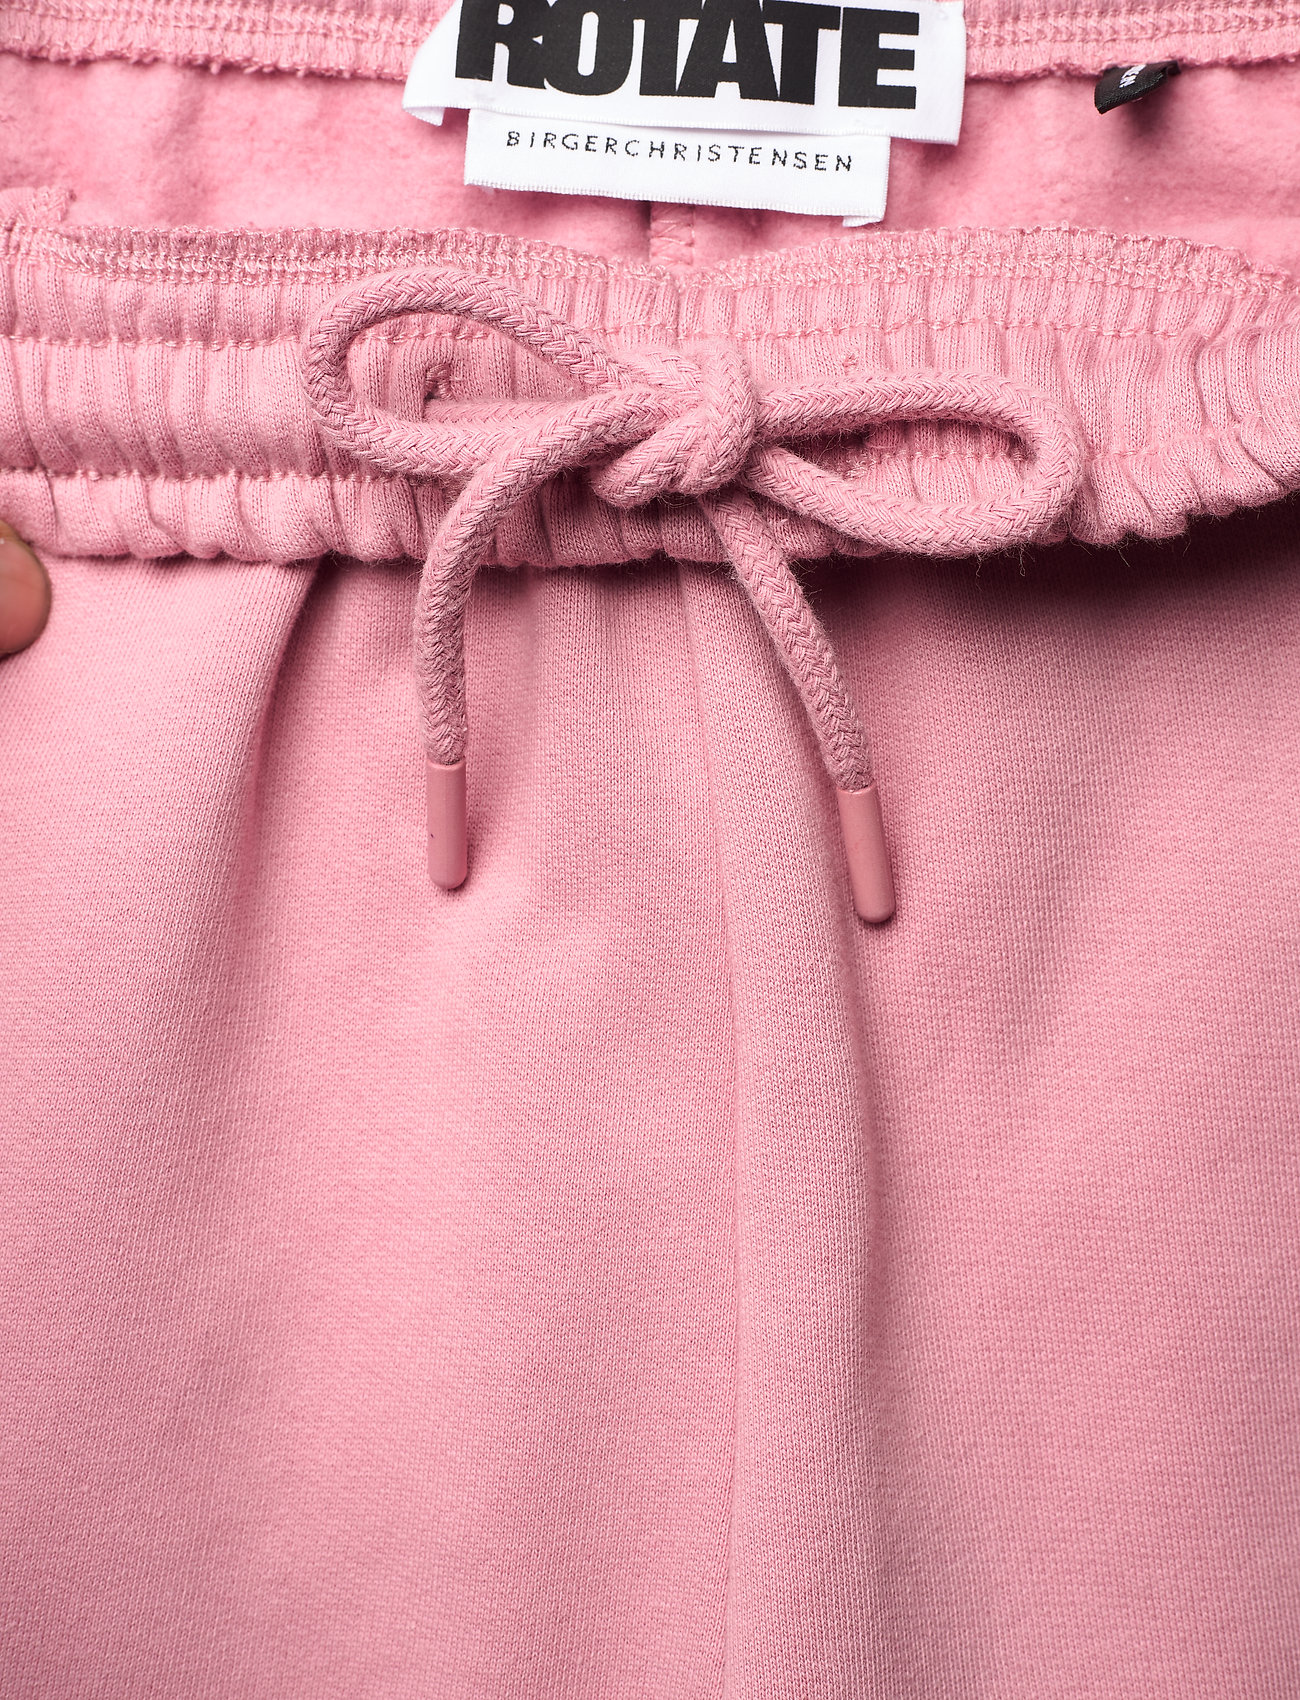 ROTATE Birger Christensen - Mimi Sweatpants Large Print - neue mode - lilas - 5